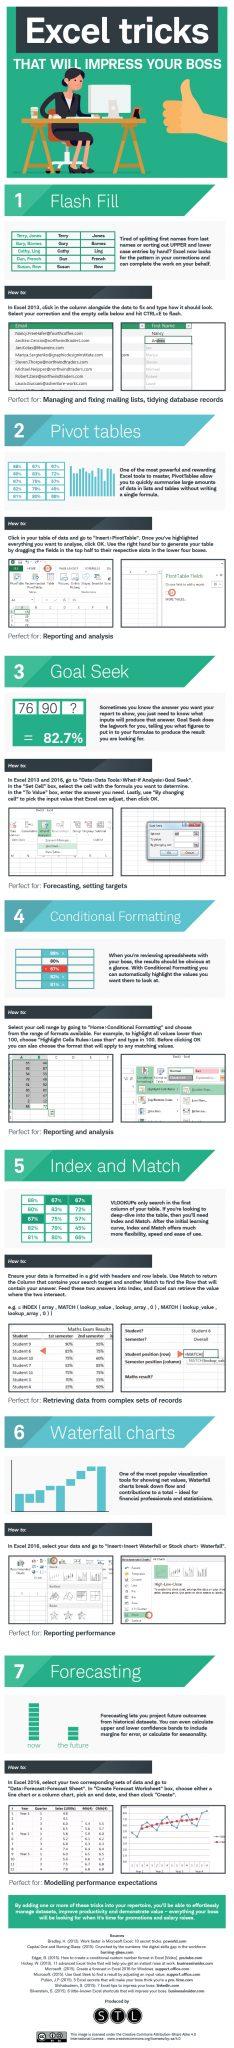 Excel Tricks to Impress Boss